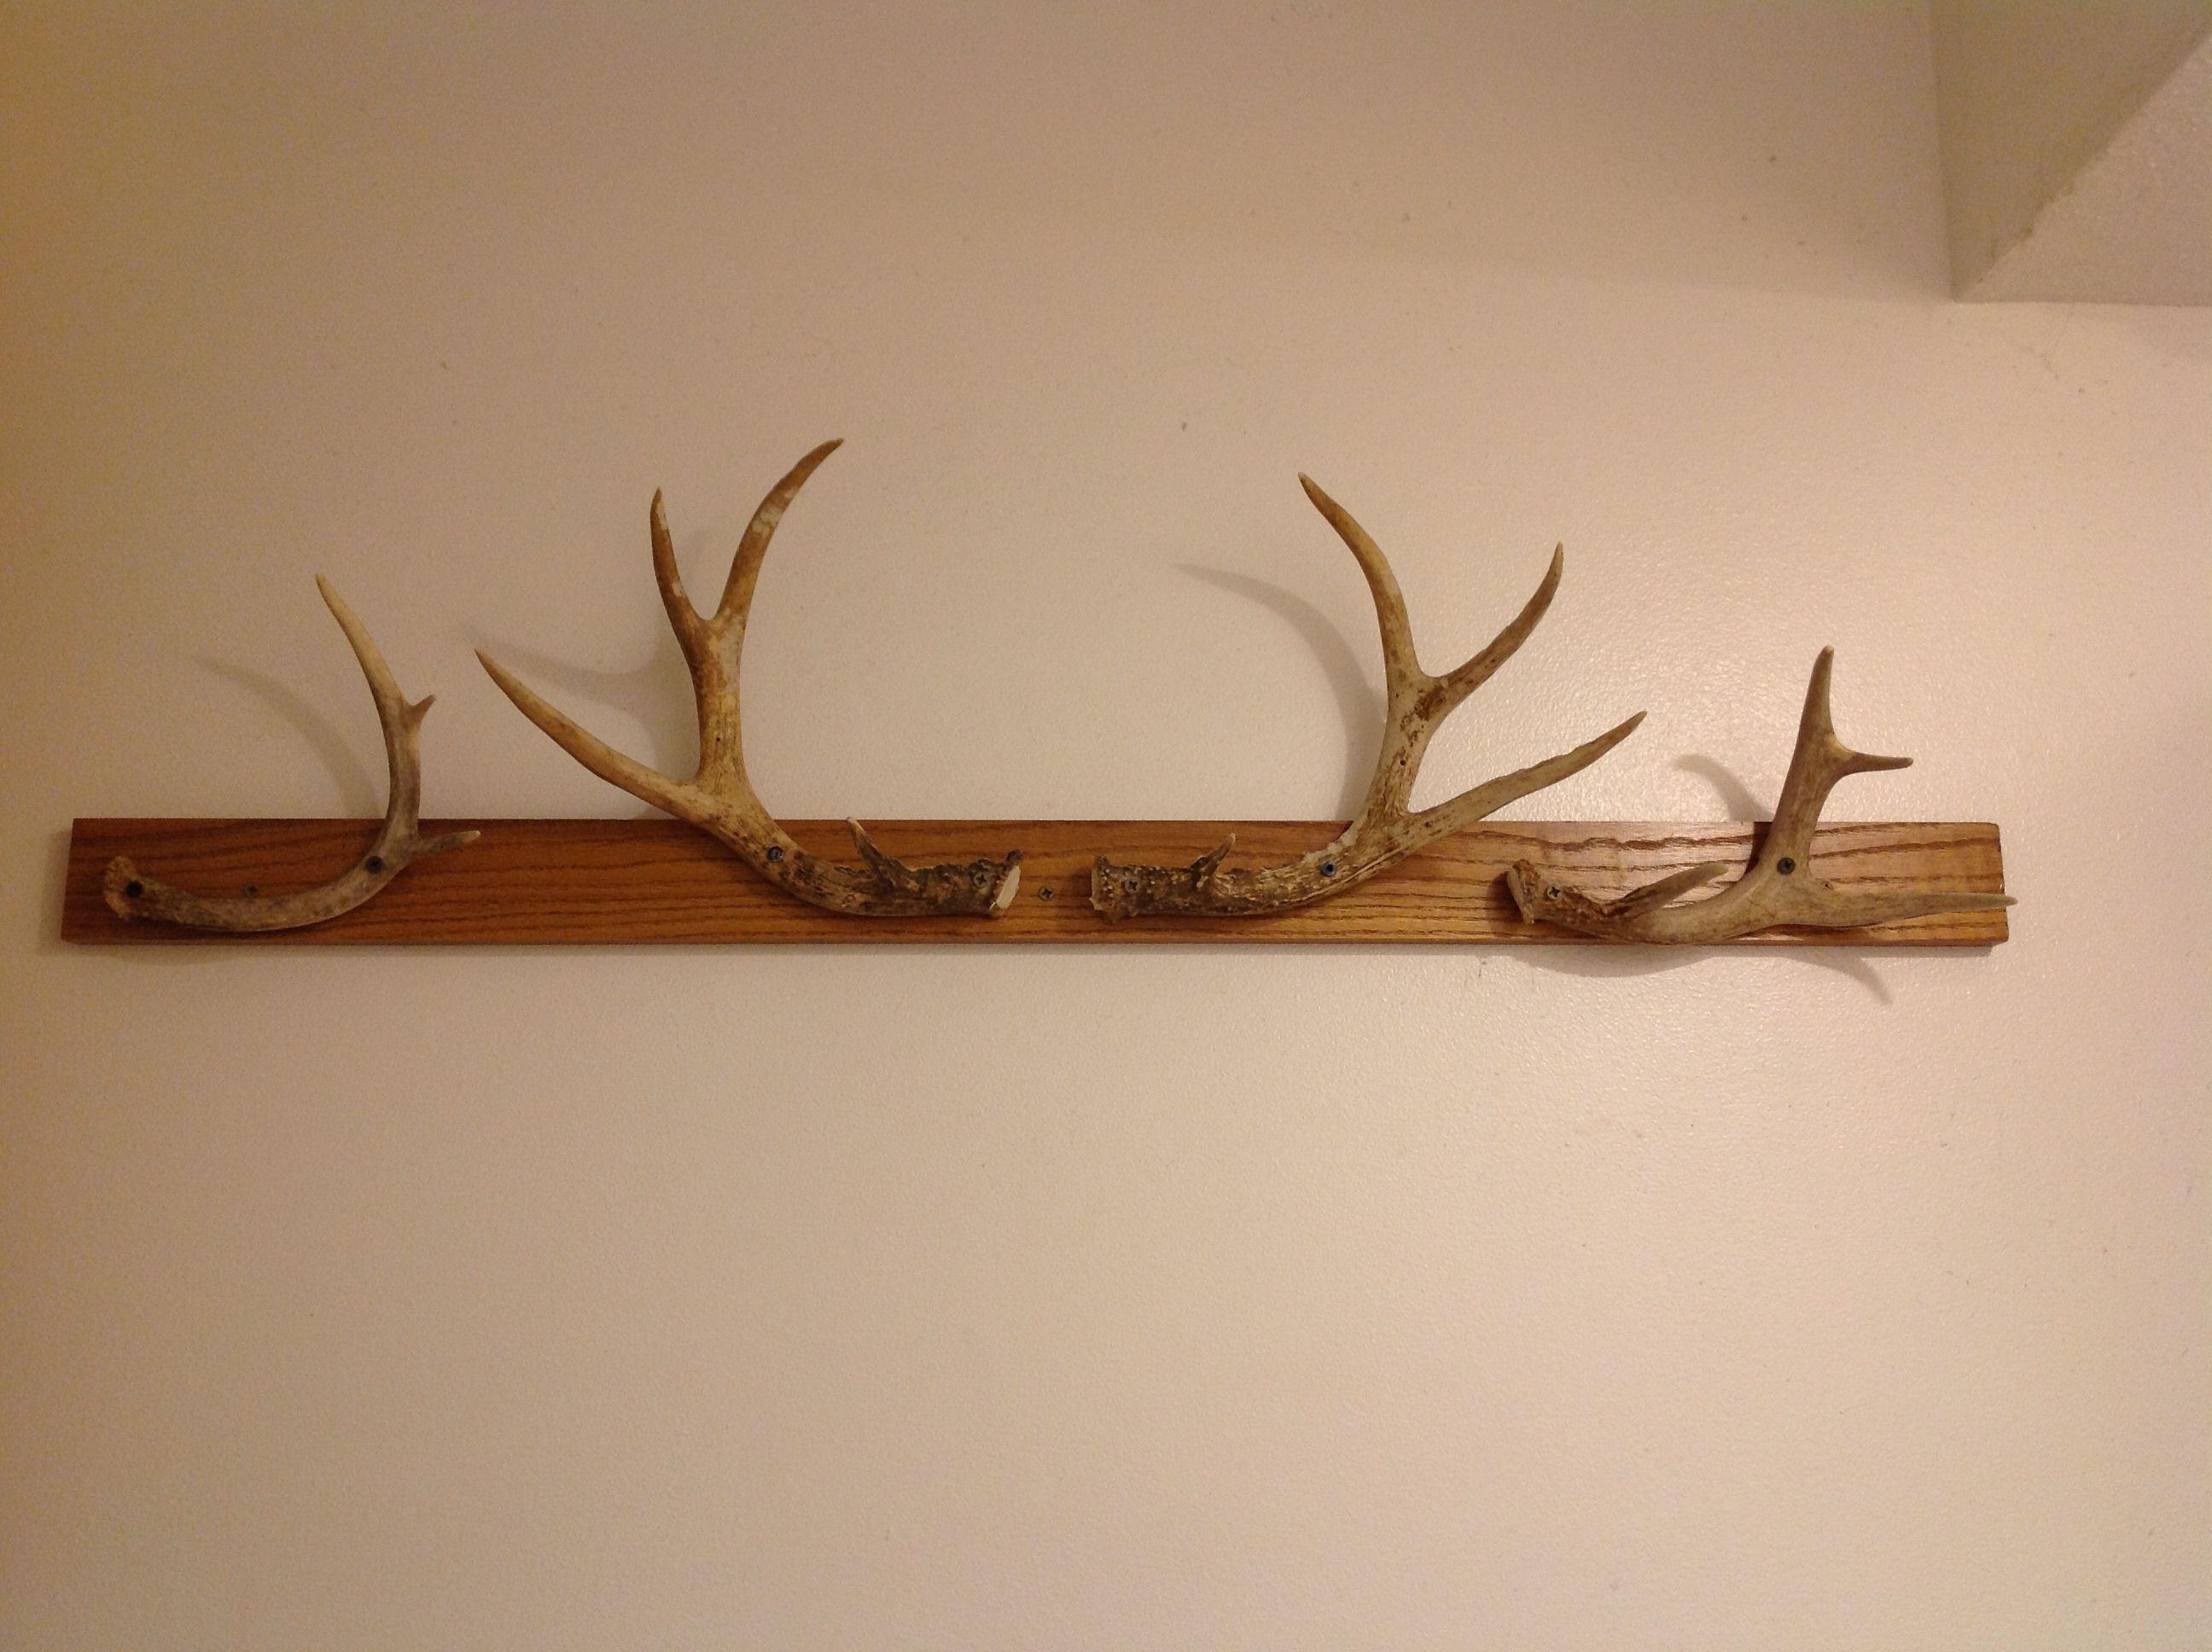 Antler Towel Rack Antlers Decor Deer Skull Decor Hunting